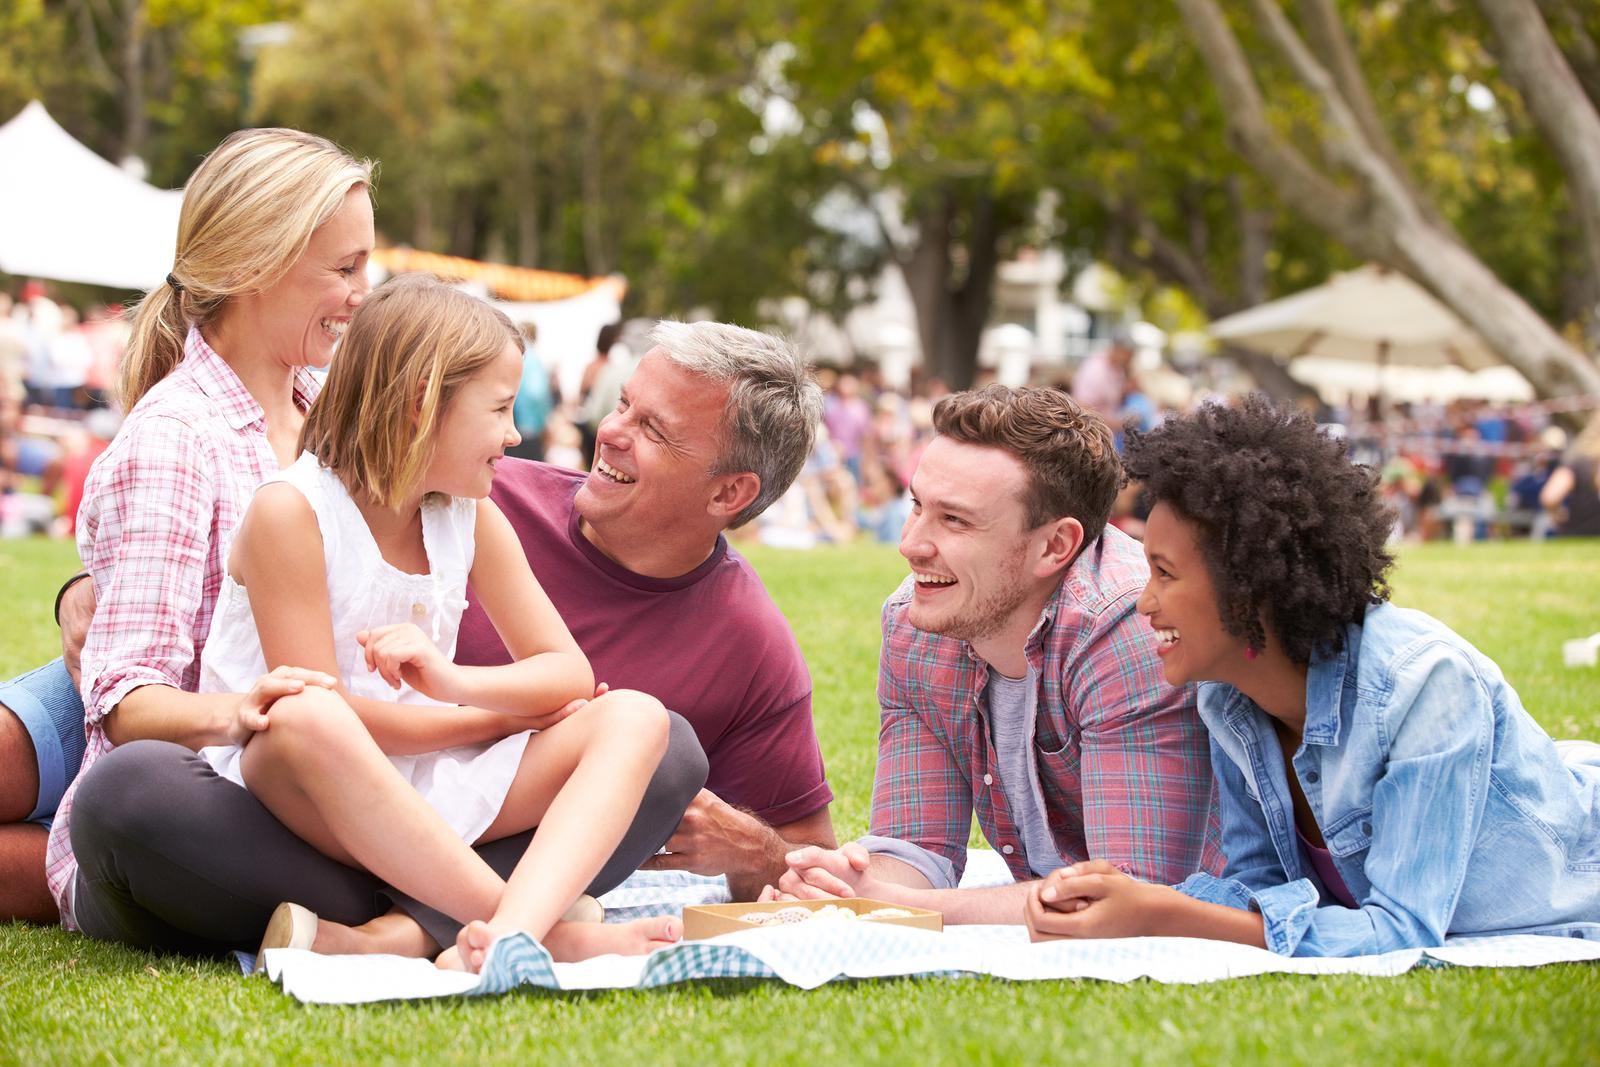 Ruth Nemzoff shares how to make the grandparent-parent relationship better.